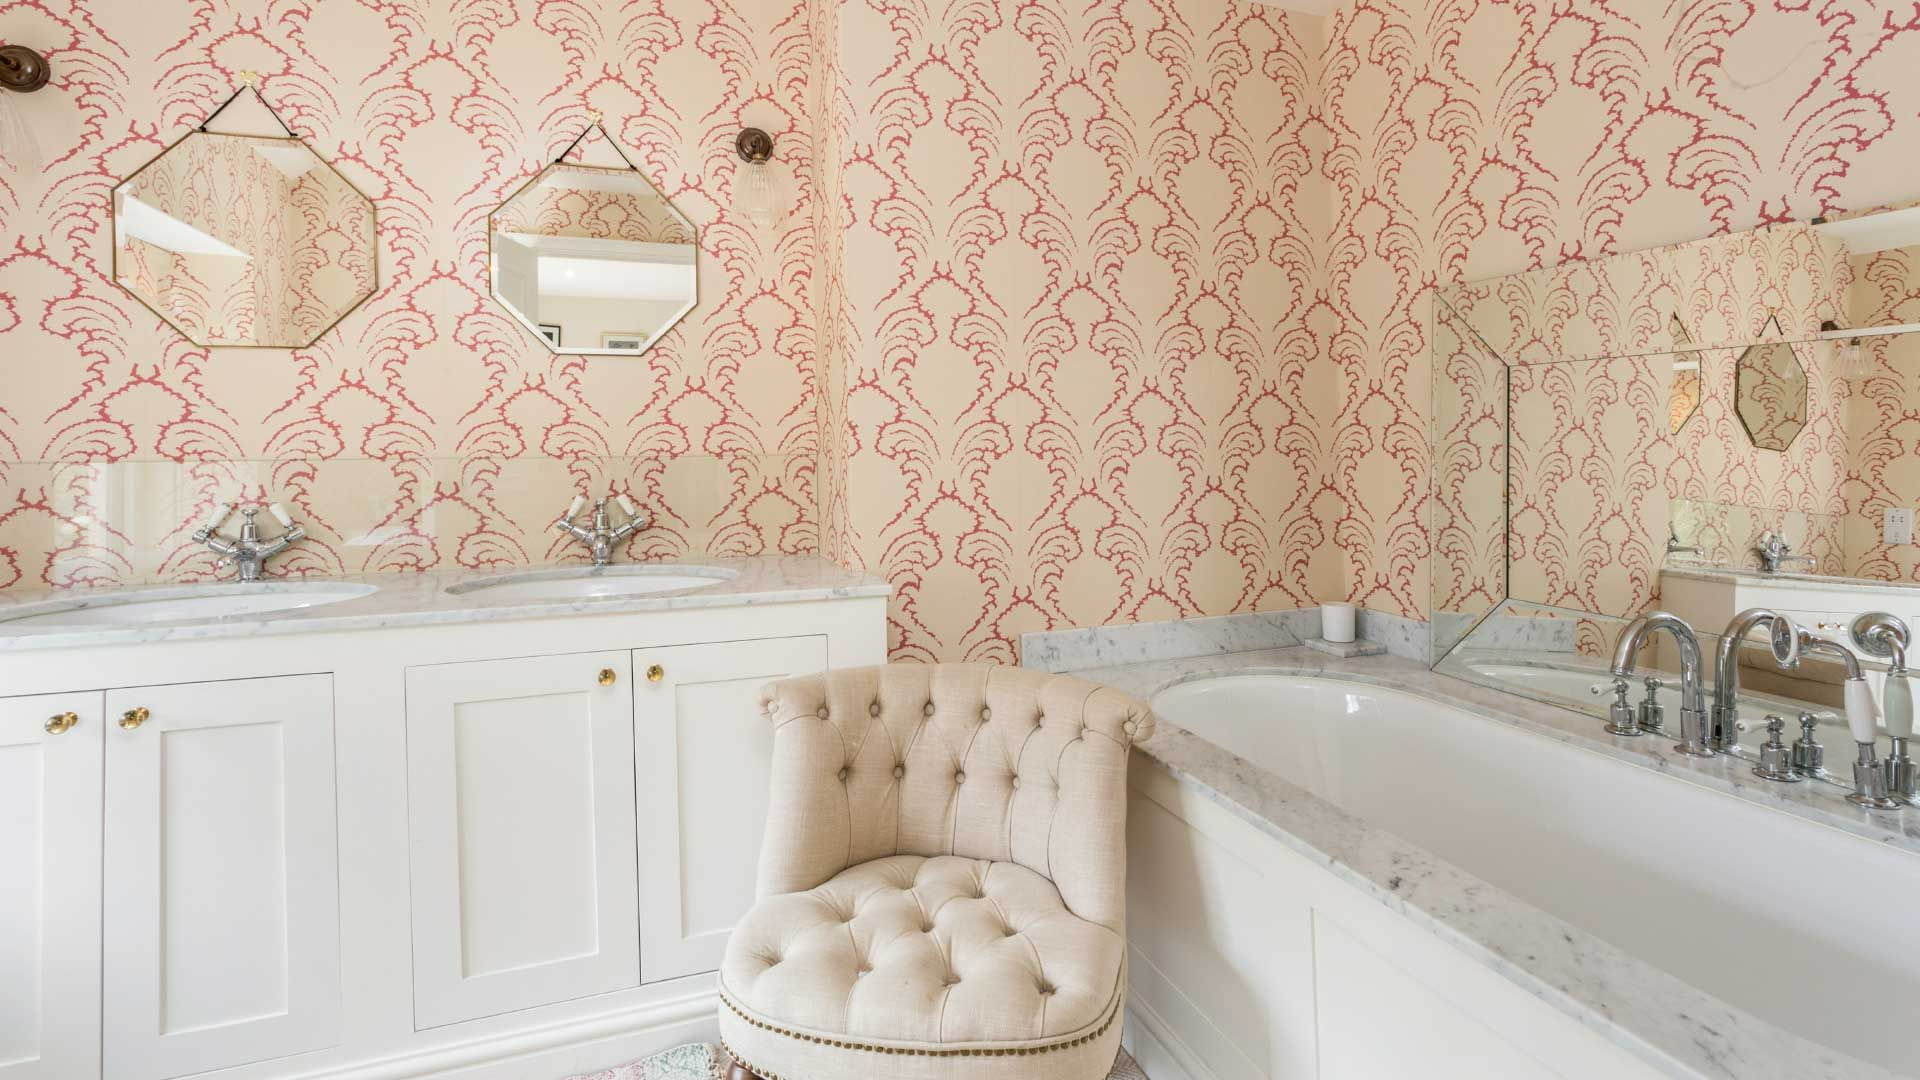 Penscombe House Bathroom - StayCotswold